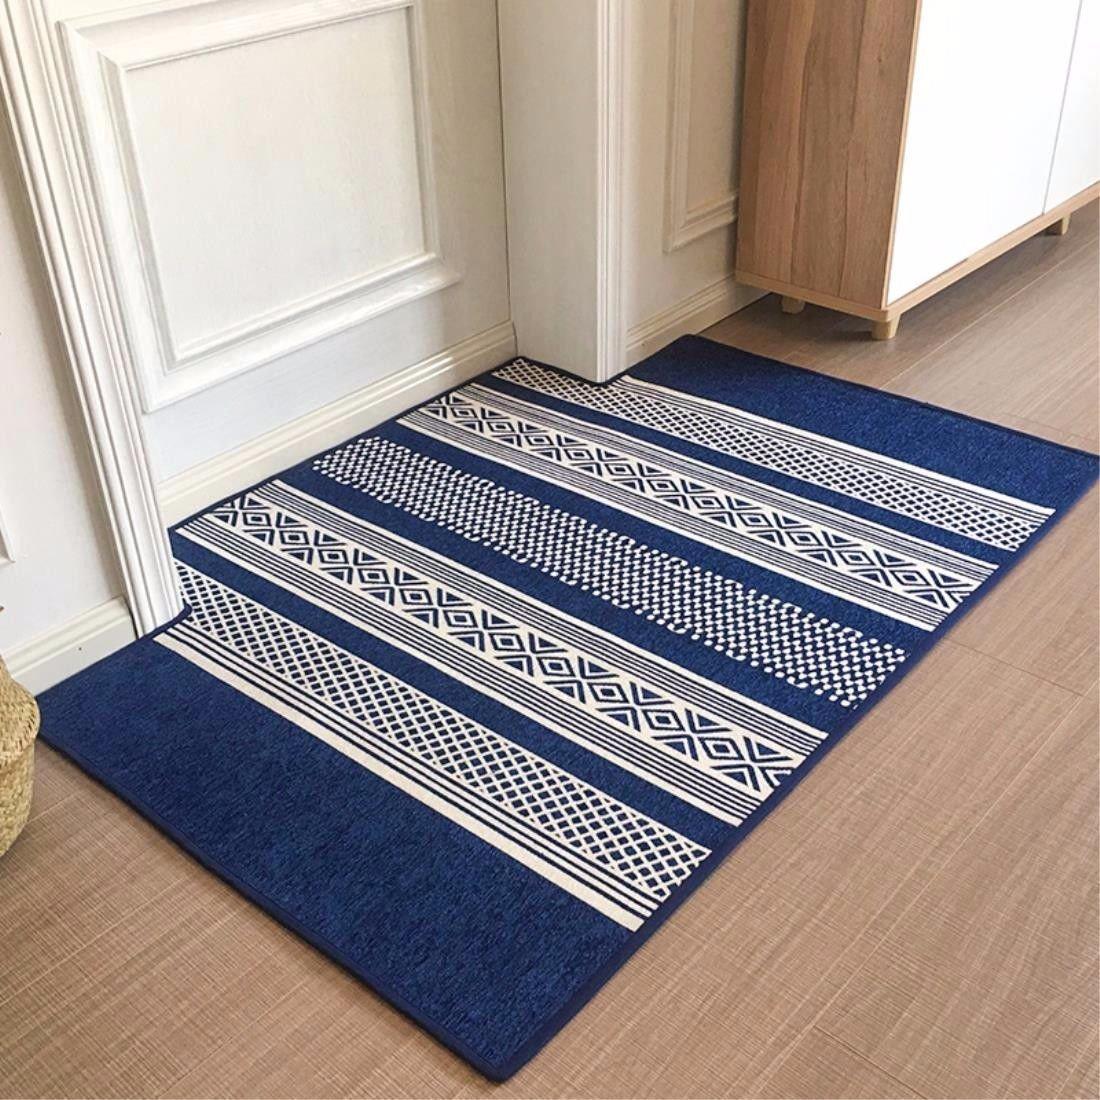 LIUXINDA-DT Modern household carpet, door, carpet, bedroom carpet, living room carpet,90cm (23.6 x 60 x 35.4 ''),蓝色